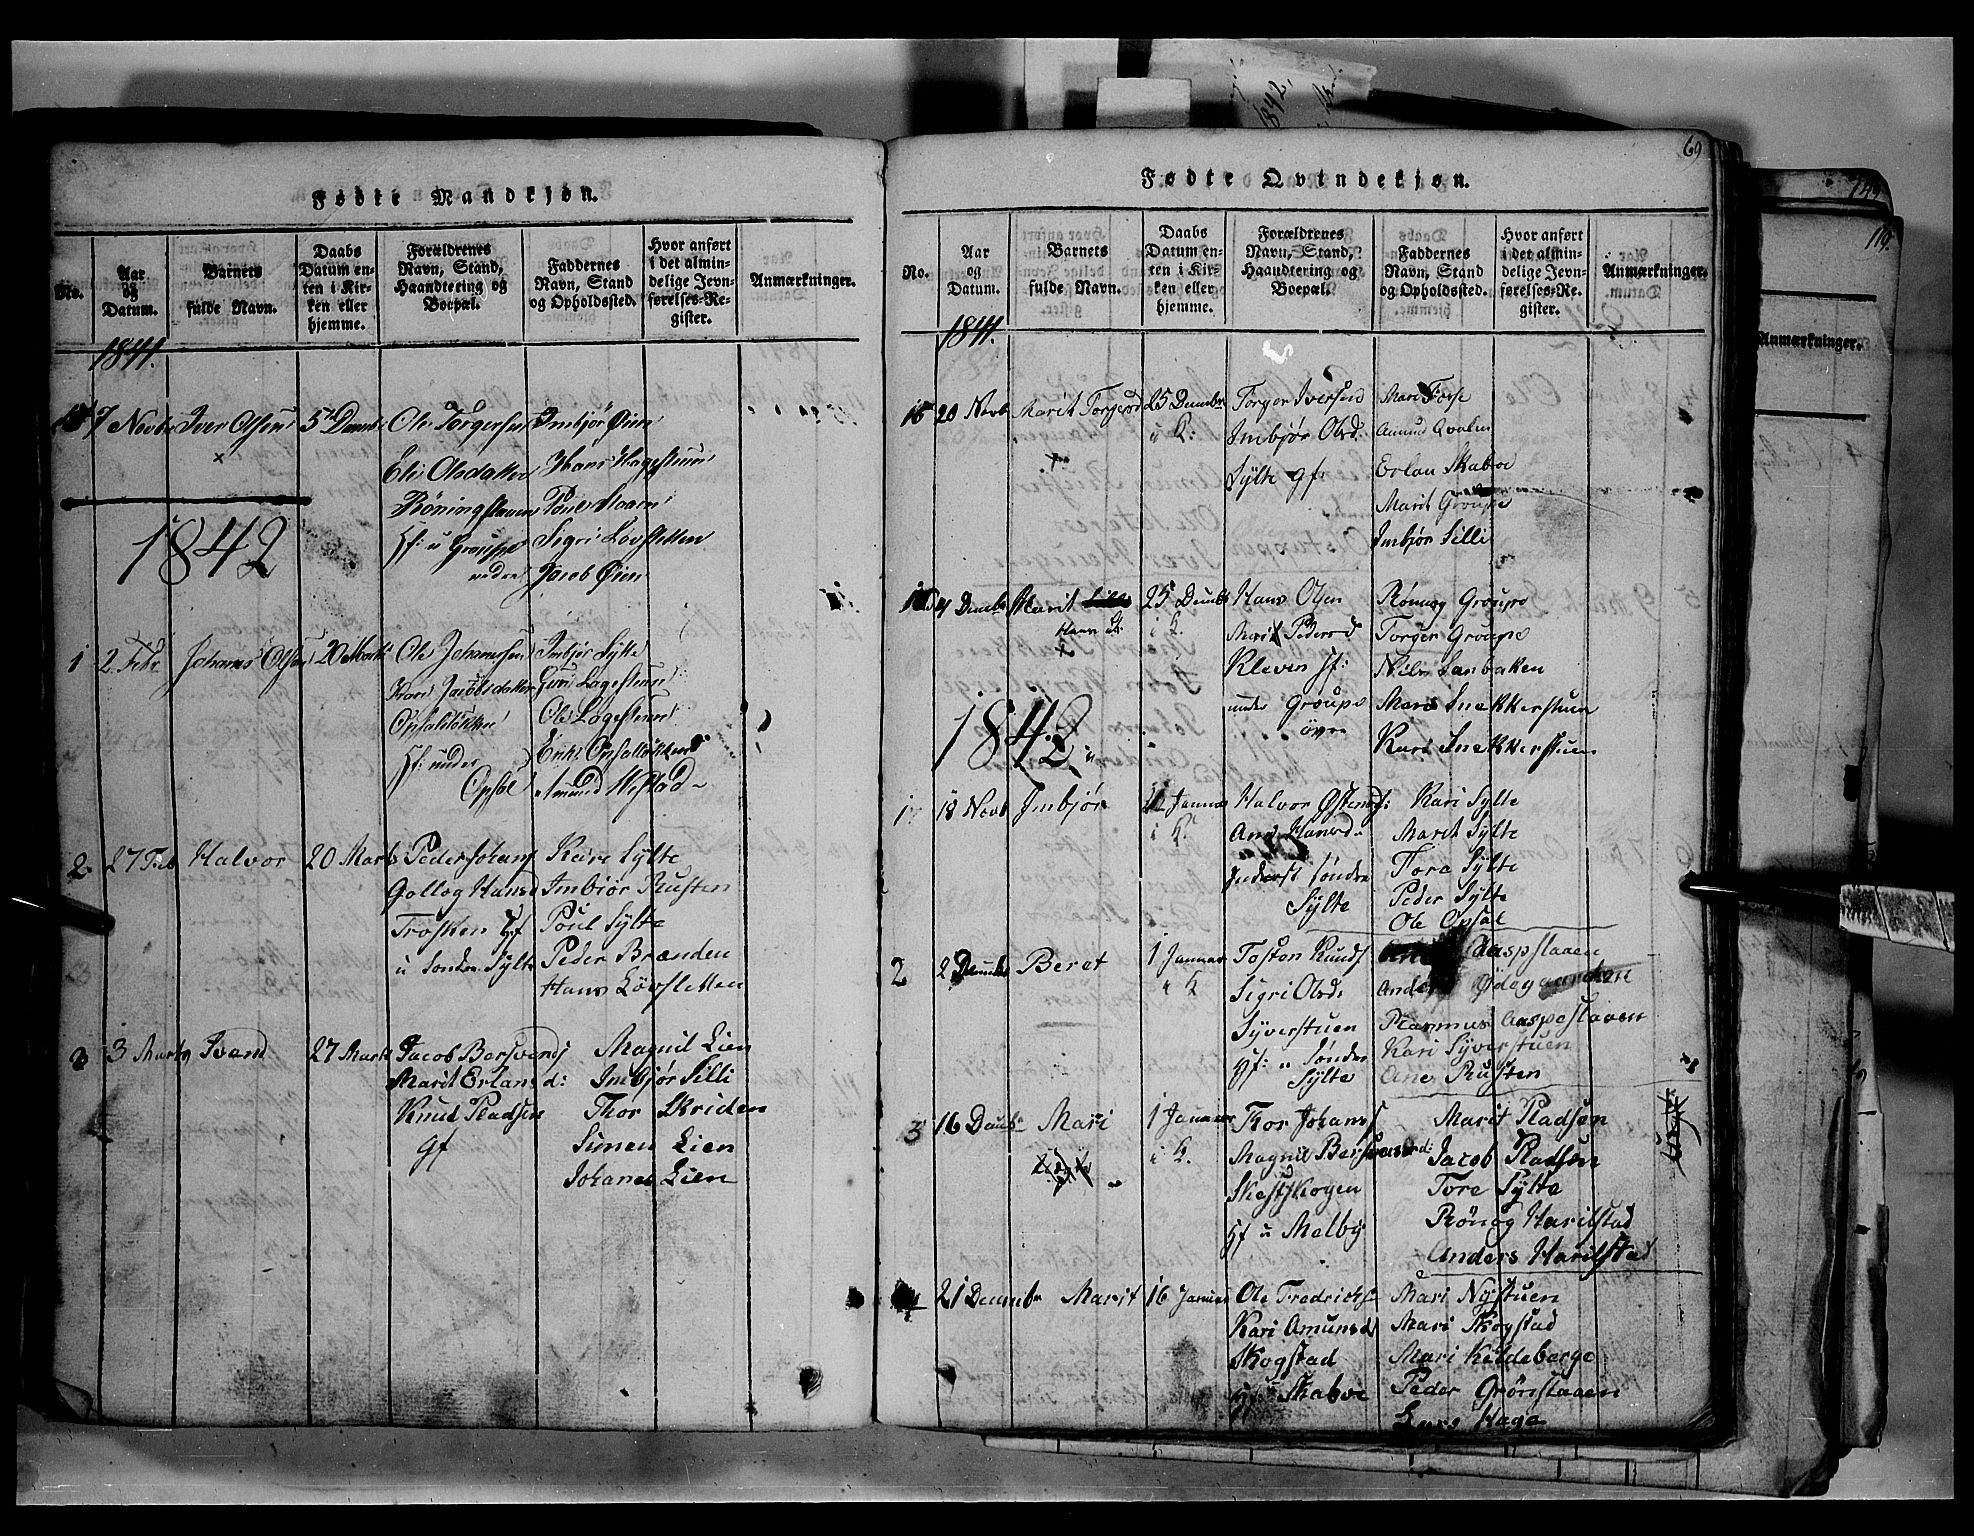 SAH, Fron prestekontor, H/Ha/Hab/L0003: Klokkerbok nr. 3, 1816-1850, s. 69